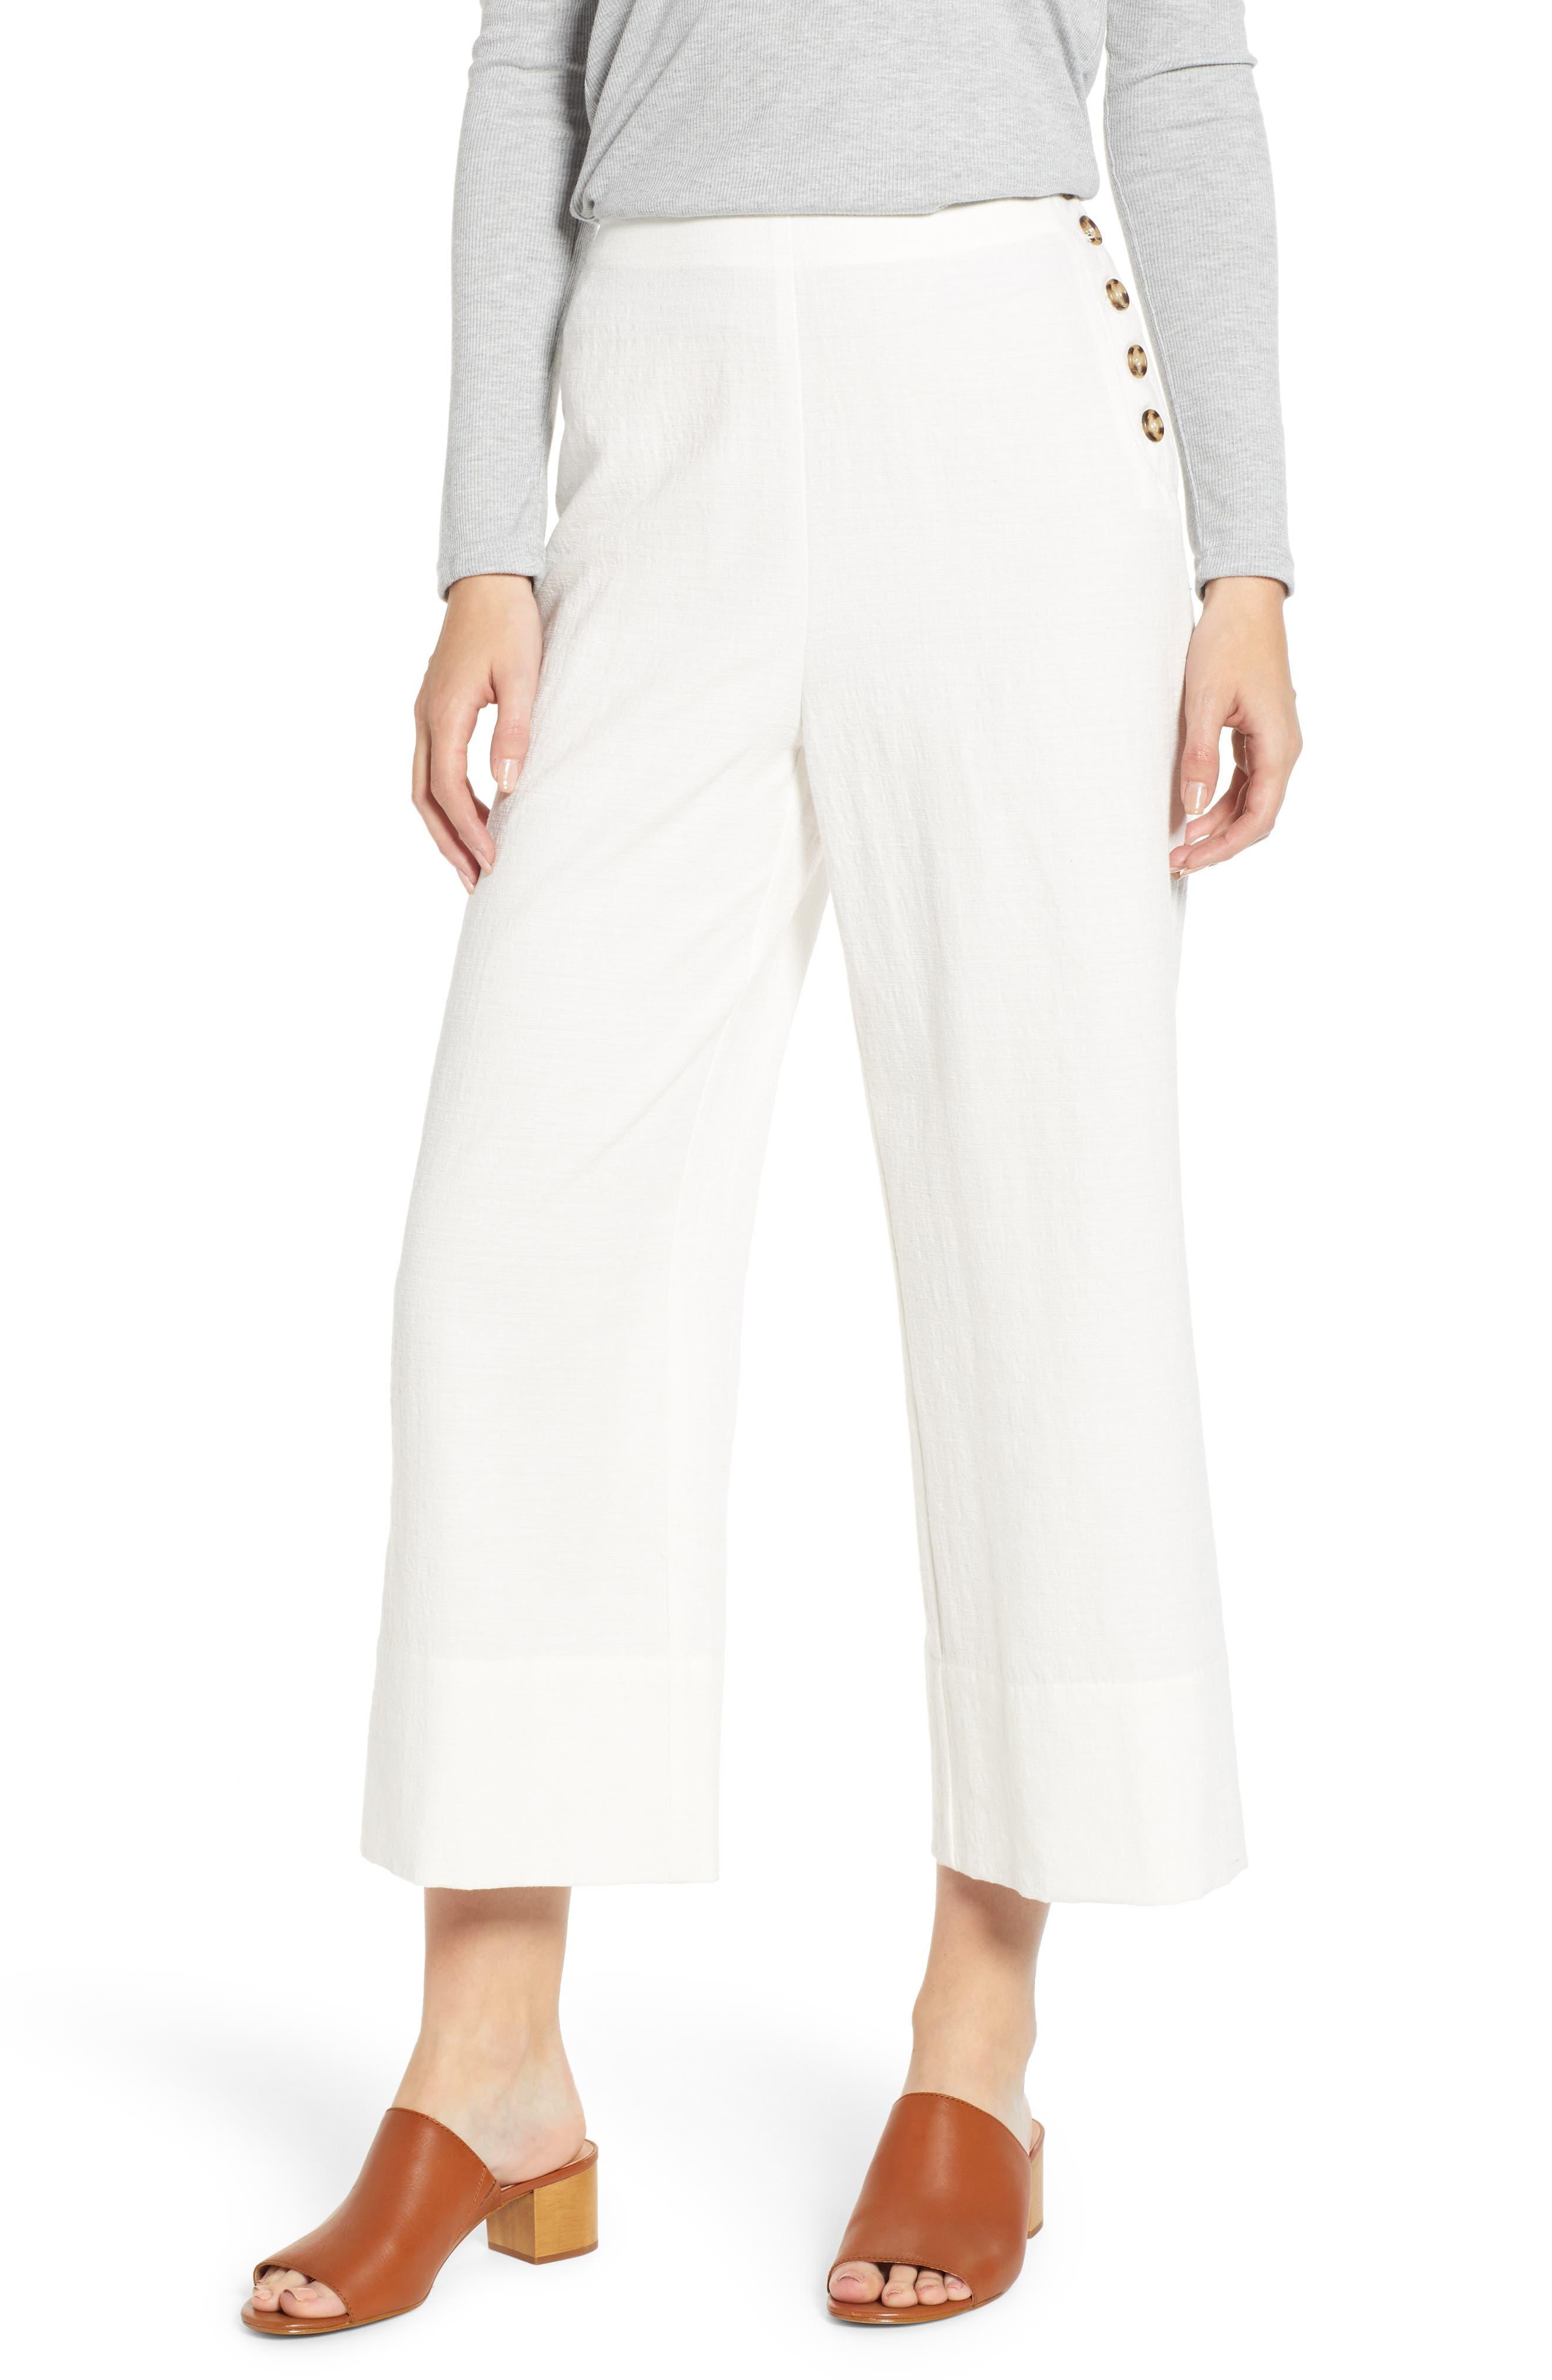 GOOD LUCK GEM Button Detail Crop Pants, Main, color, CREAM